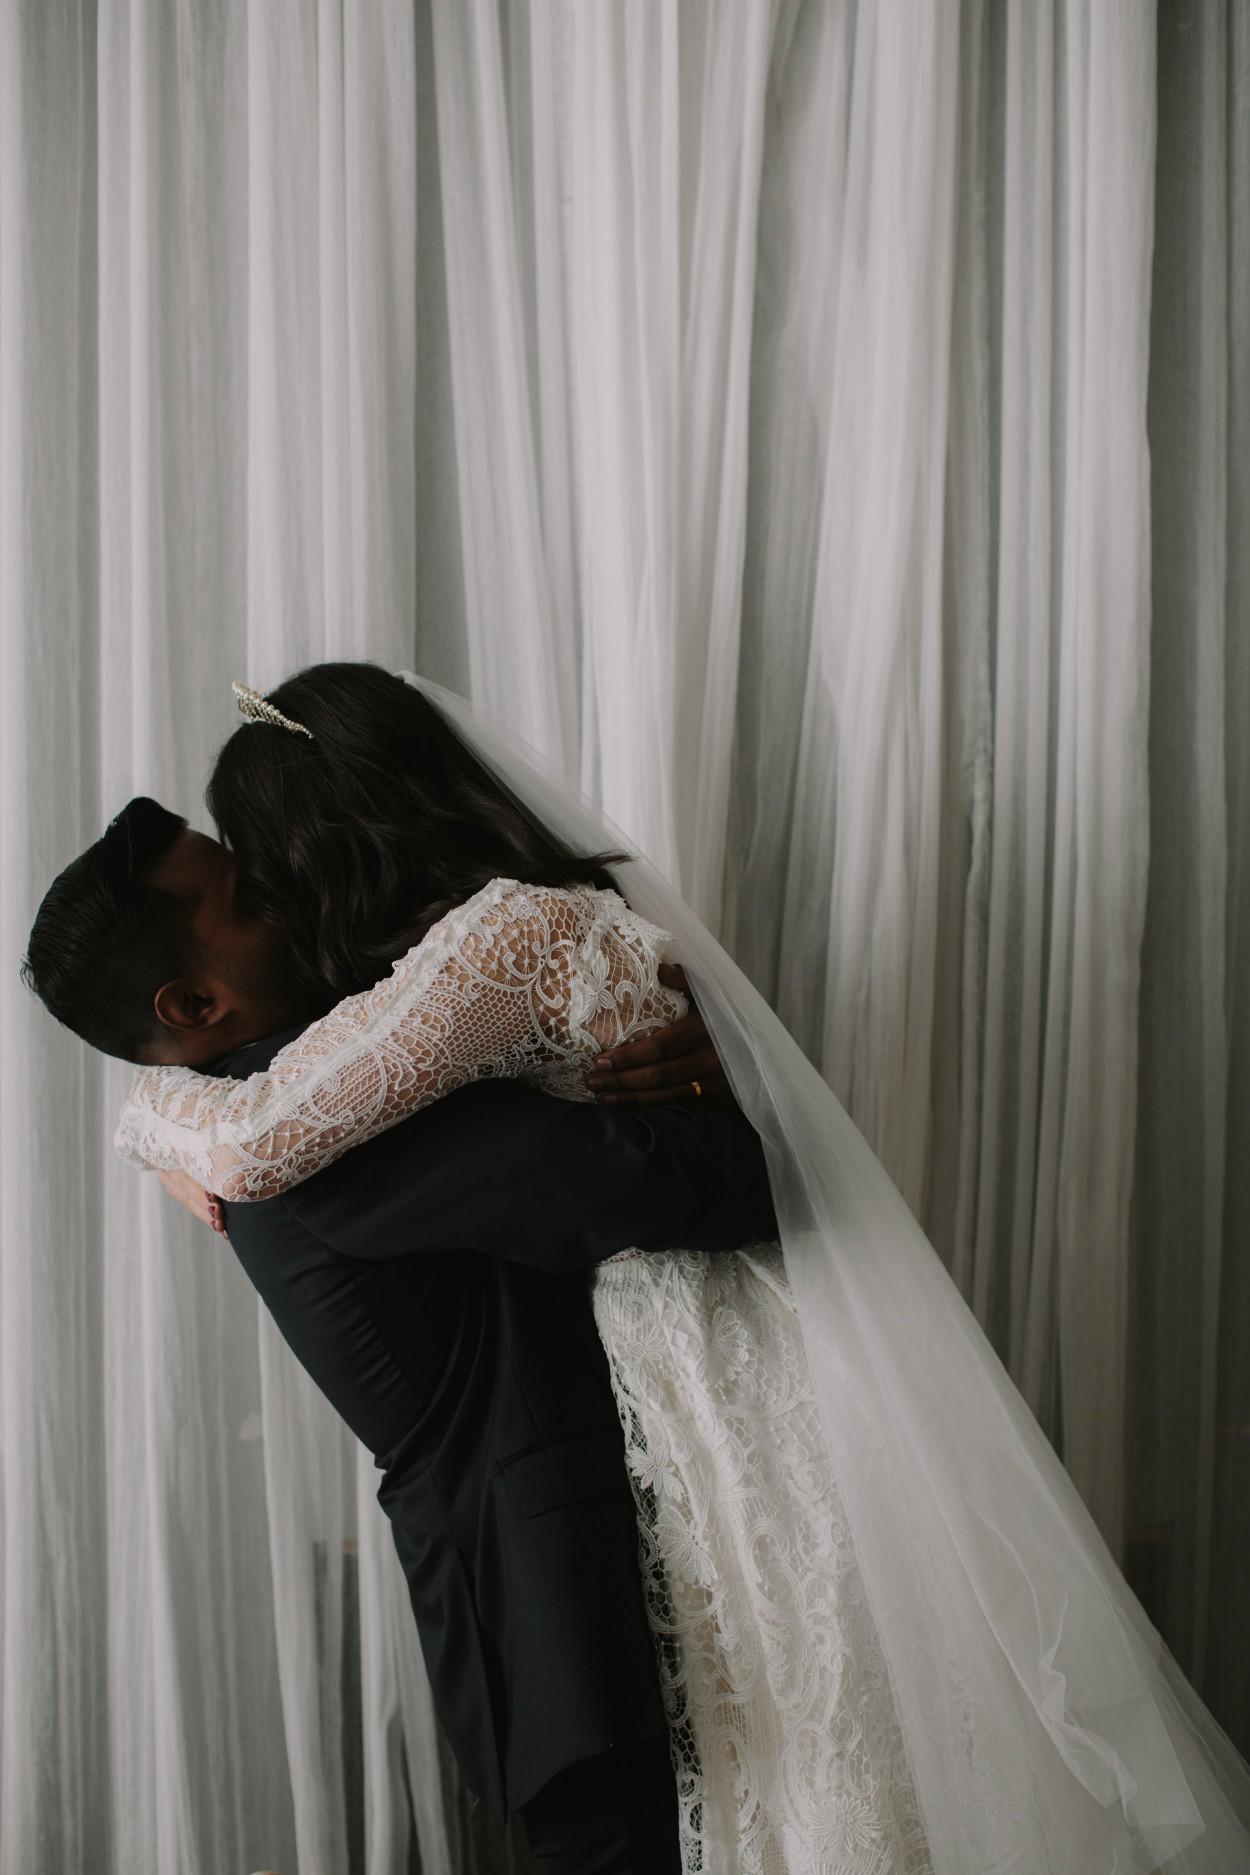 I-Got-You-Babe-Weddings-The-095George-Ballroom-St-Kilda-Wedding-Amy-Abhi.jpg